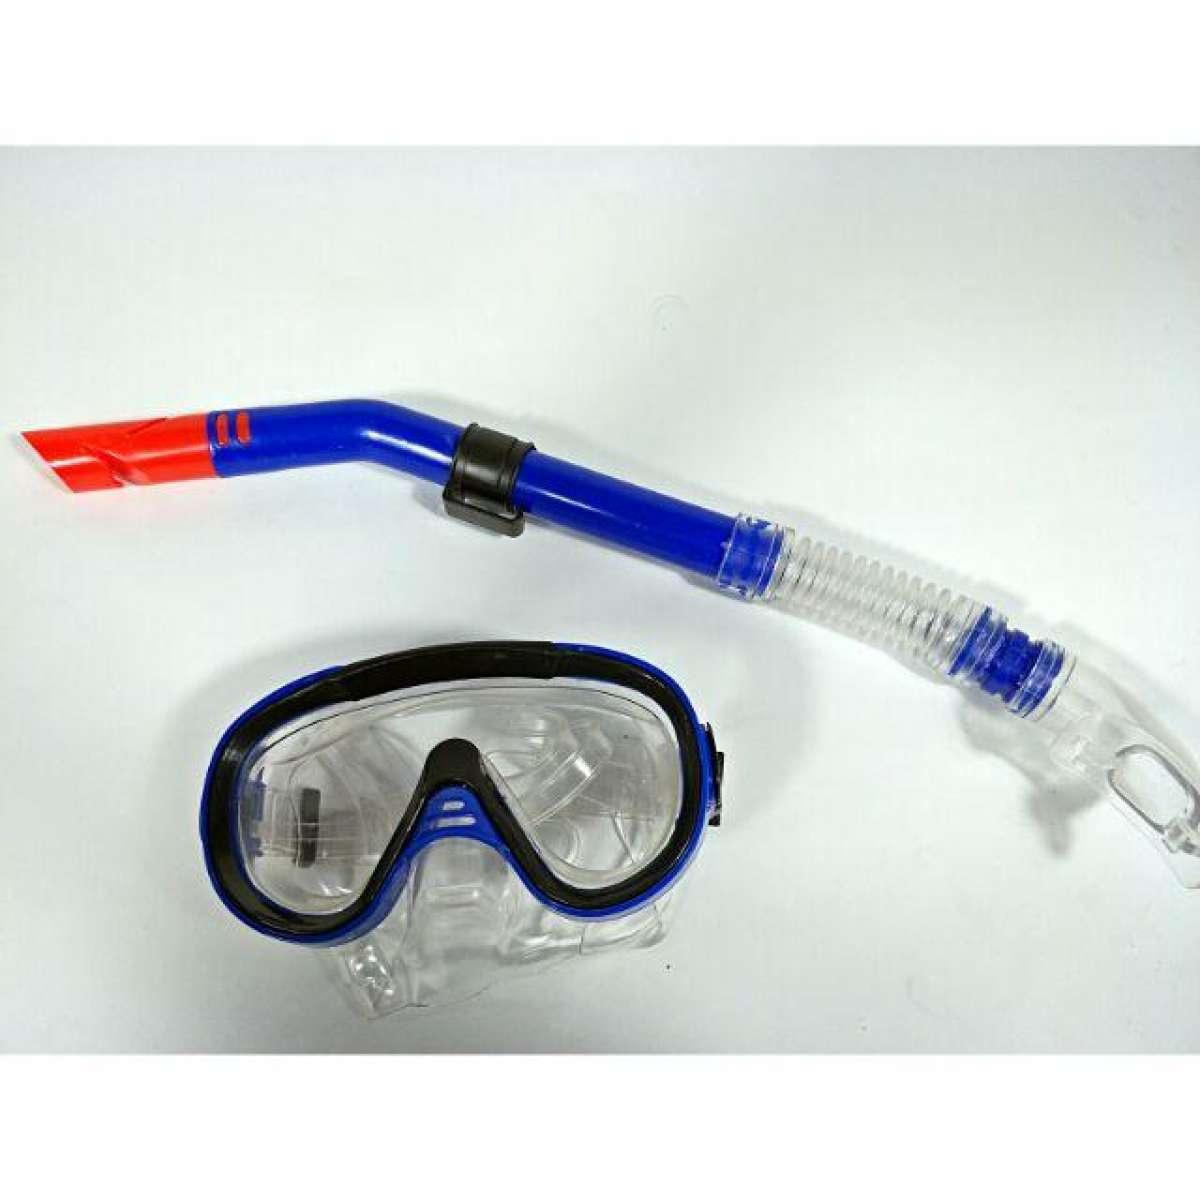 Dive Diving Mask Goggles Dry Snorkel Combo Set Swimming Scuba Snorkeling  Gear - Intl#01